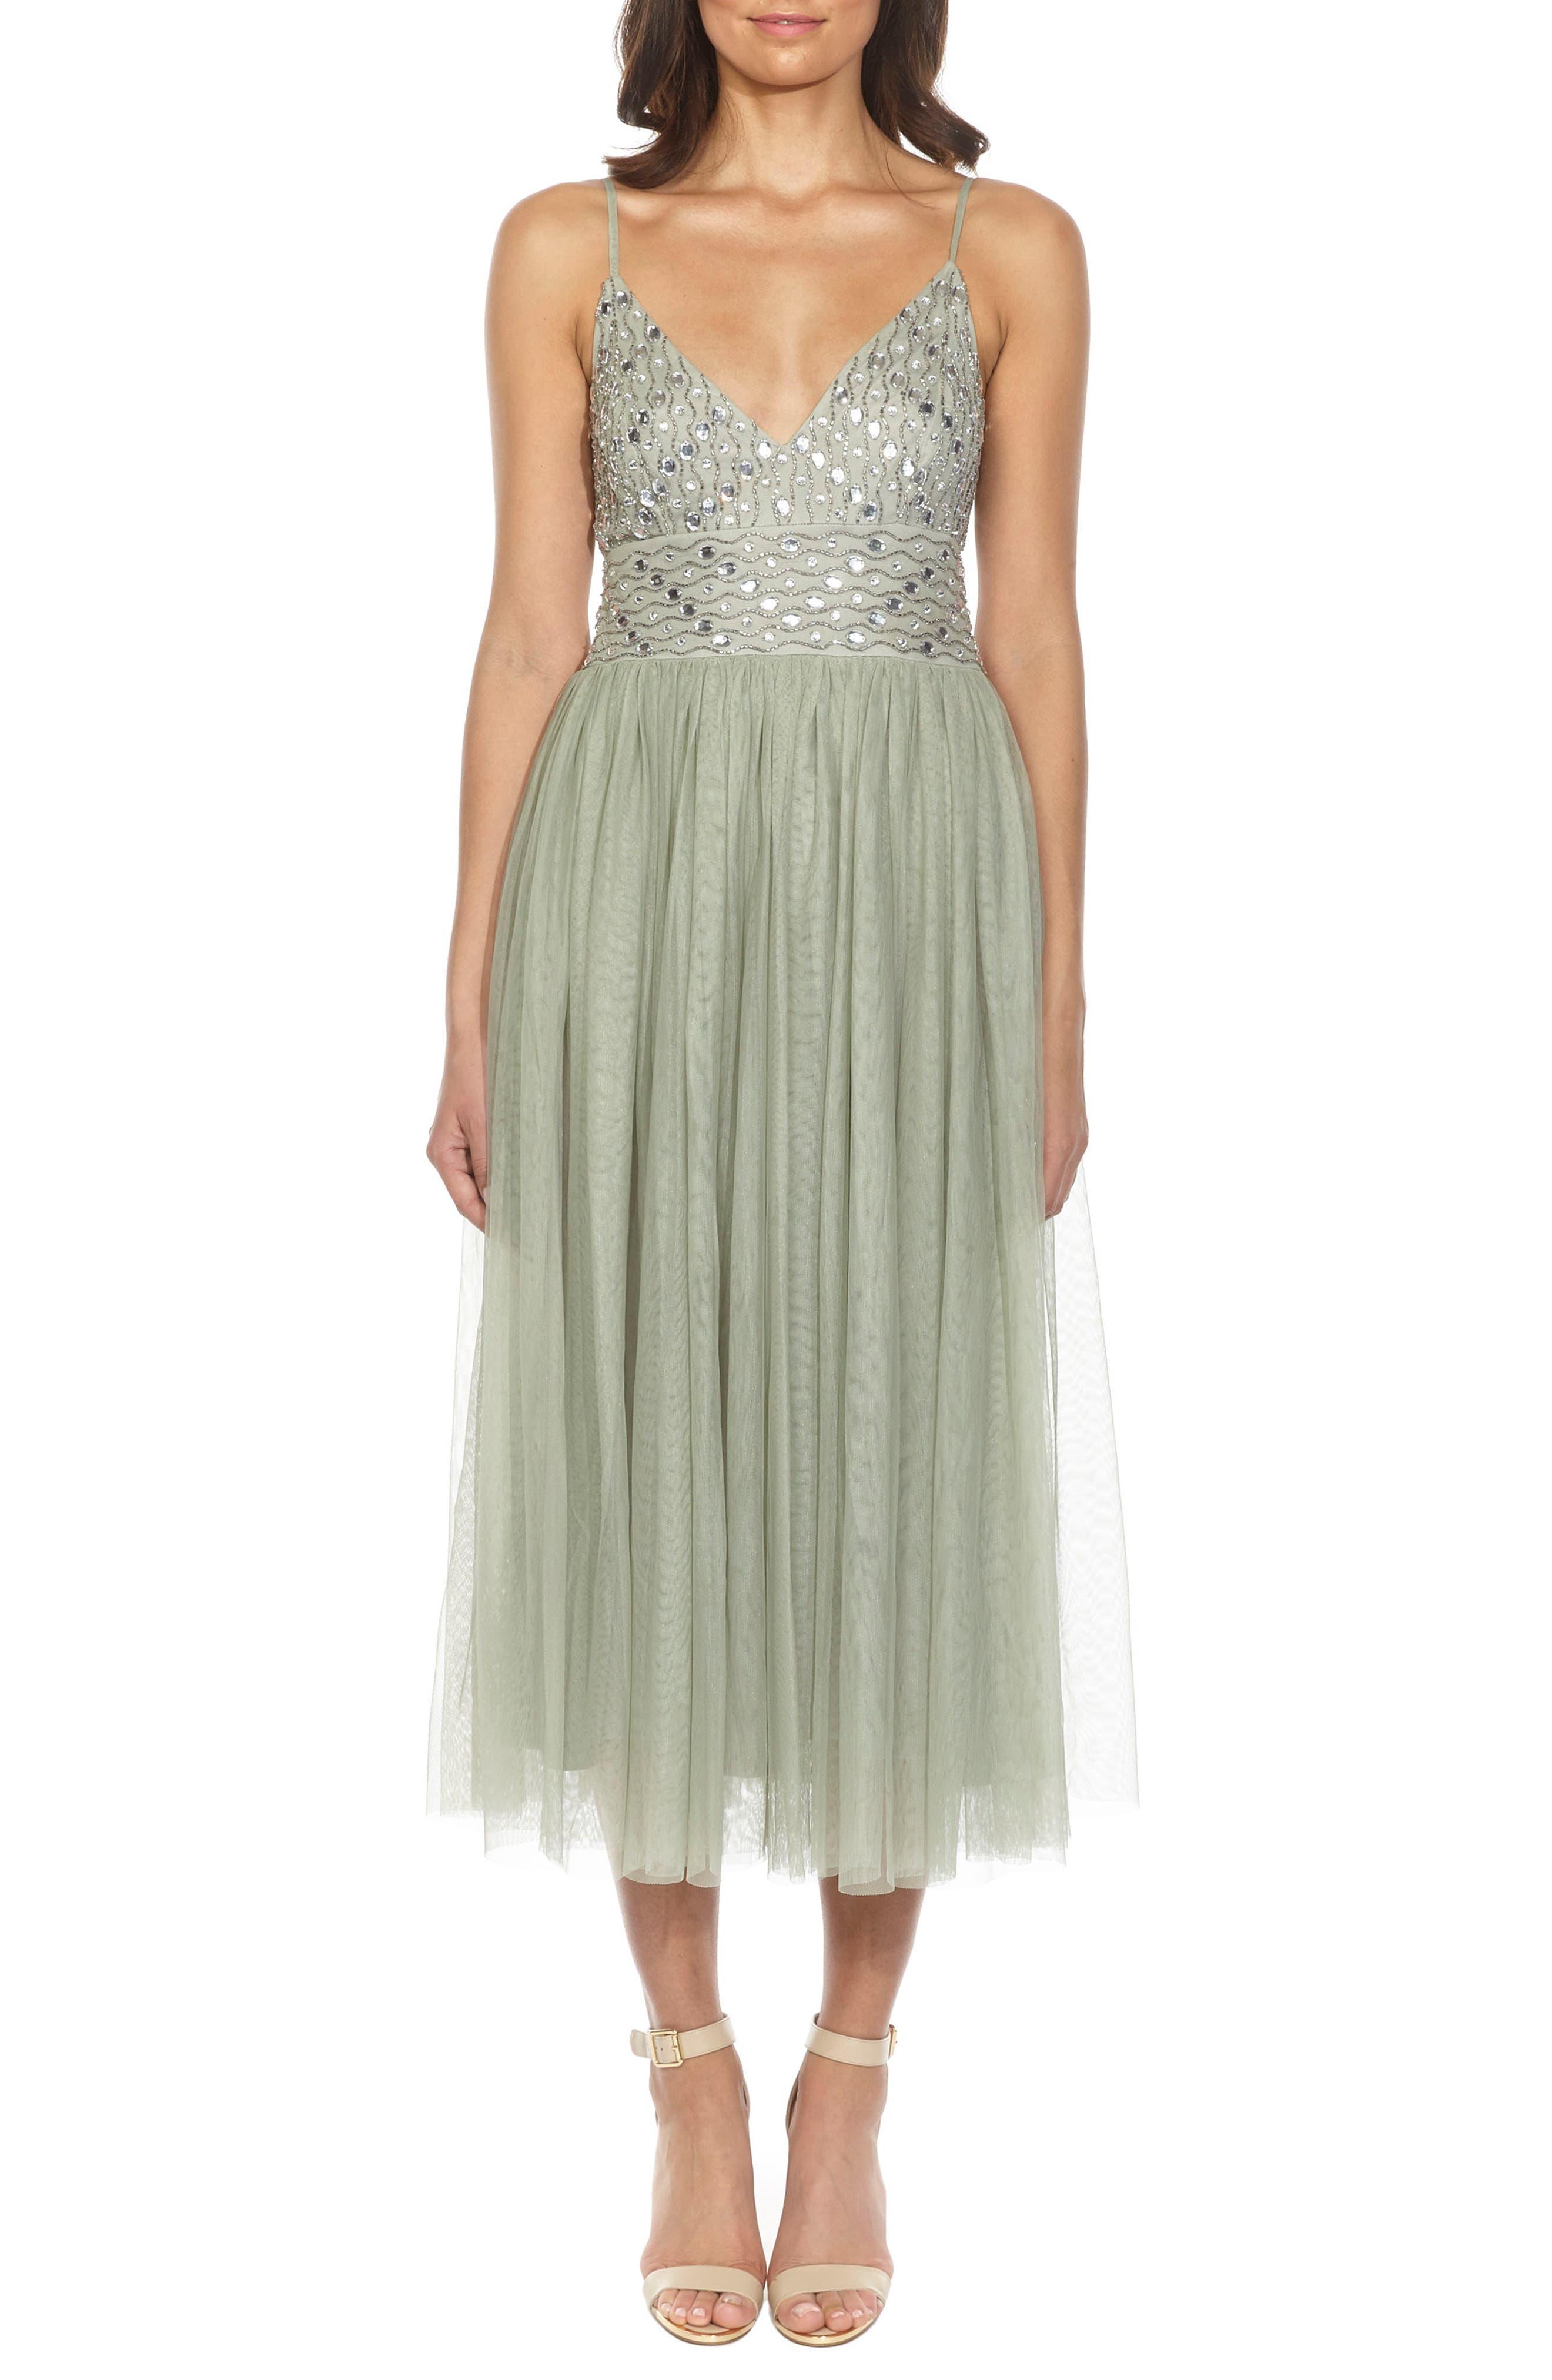 Maeve Beaded Maxi Dress,                             Alternate thumbnail 5, color,                             330